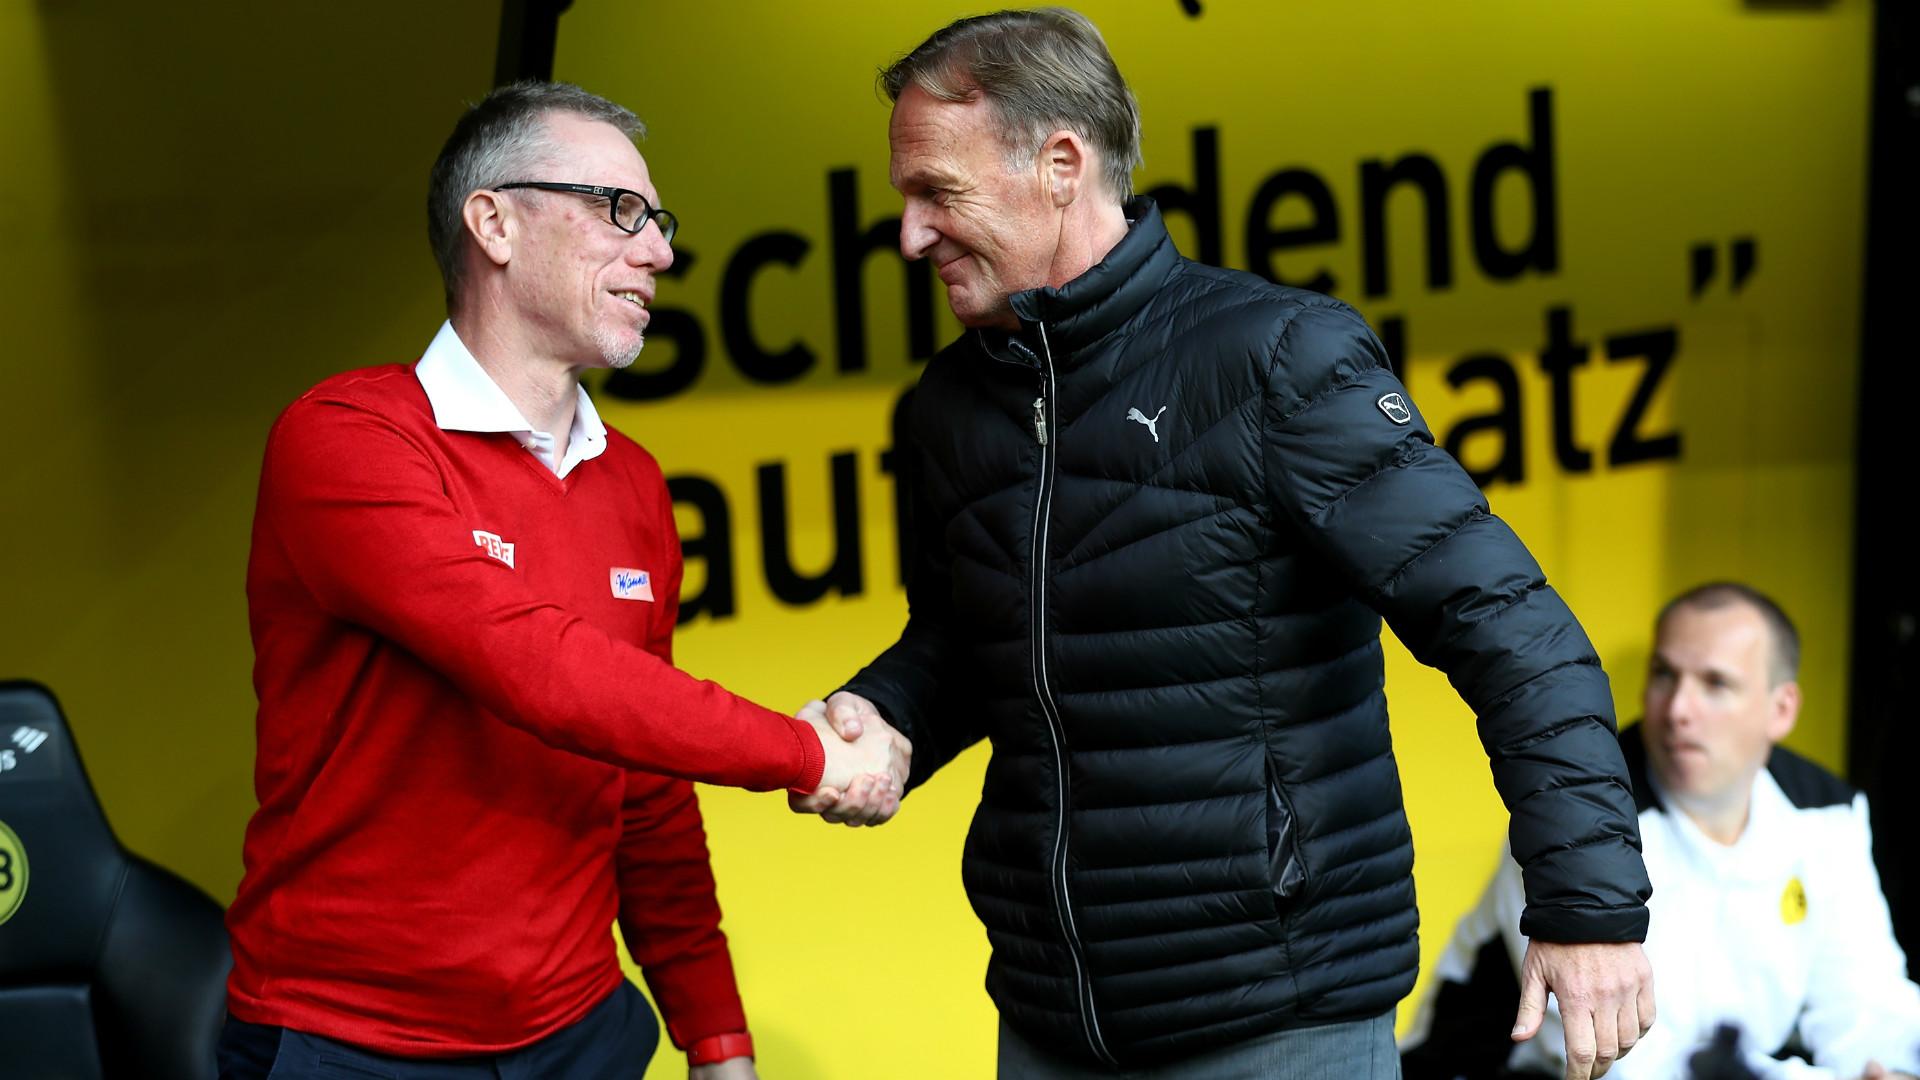 Peter Stoger Hans Joachim Watzke Borussia Dortmund